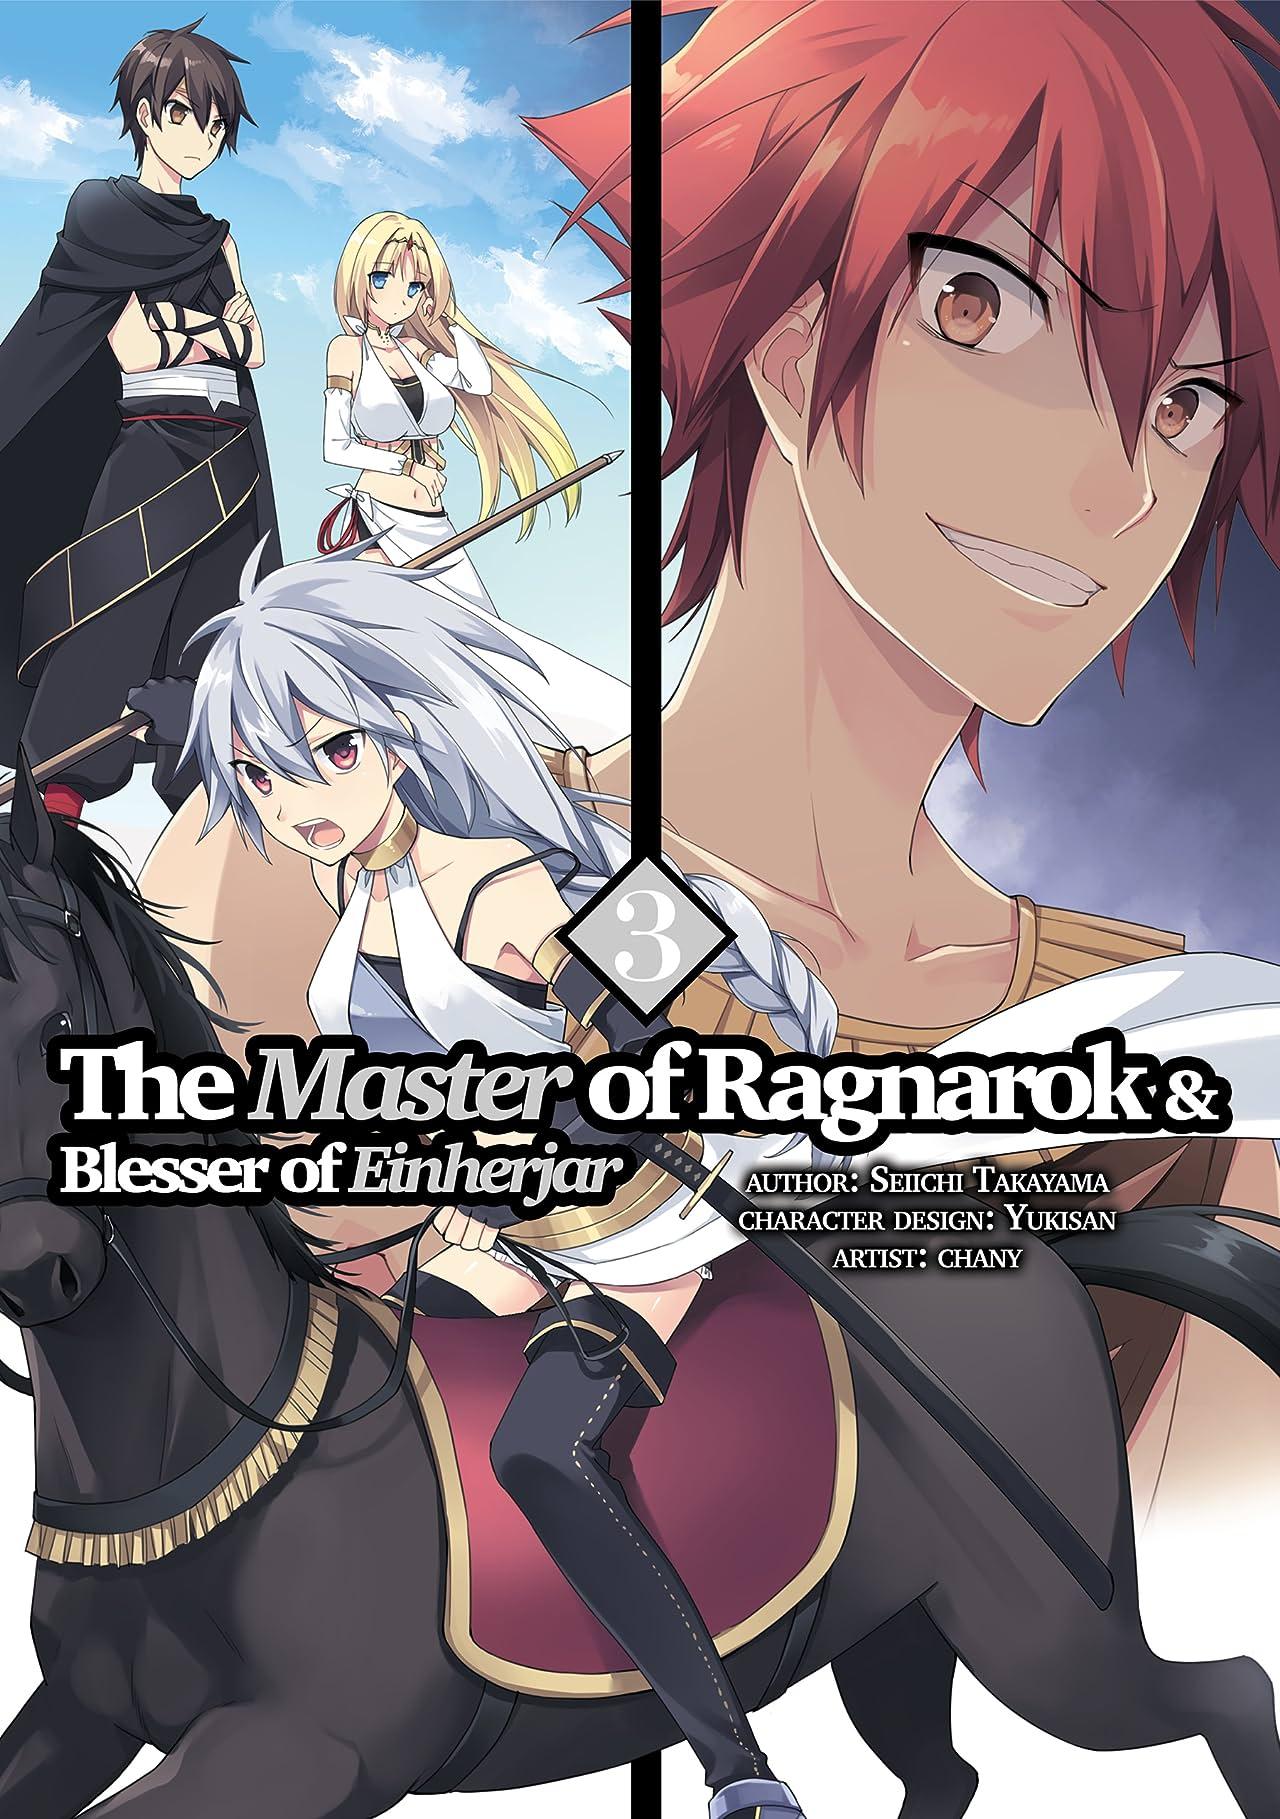 The Master of Ragnarok & Blesser of Einherjar Vol. 3